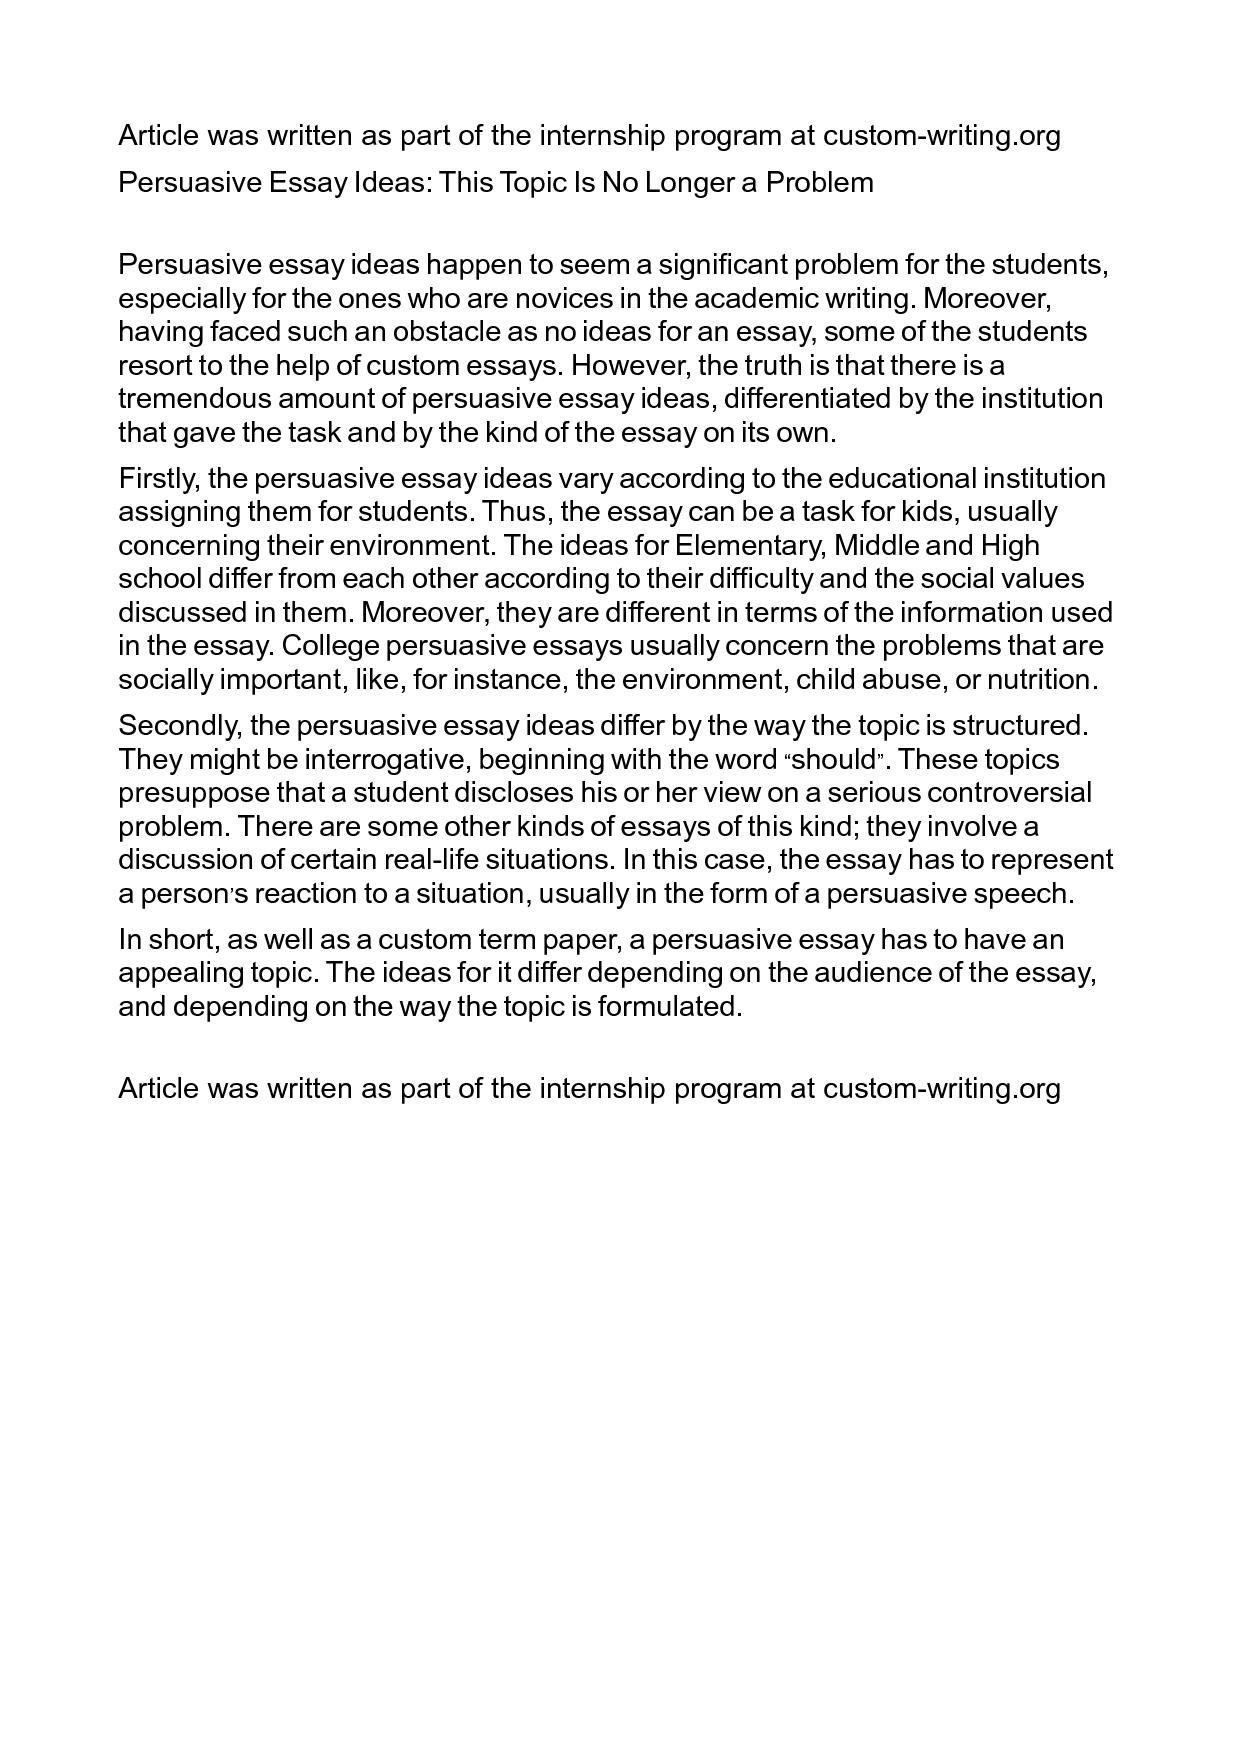 012 Persuasive Essay Topics Middle 480361 Example For Imposing School Prompts Argumentative High Pdf Full